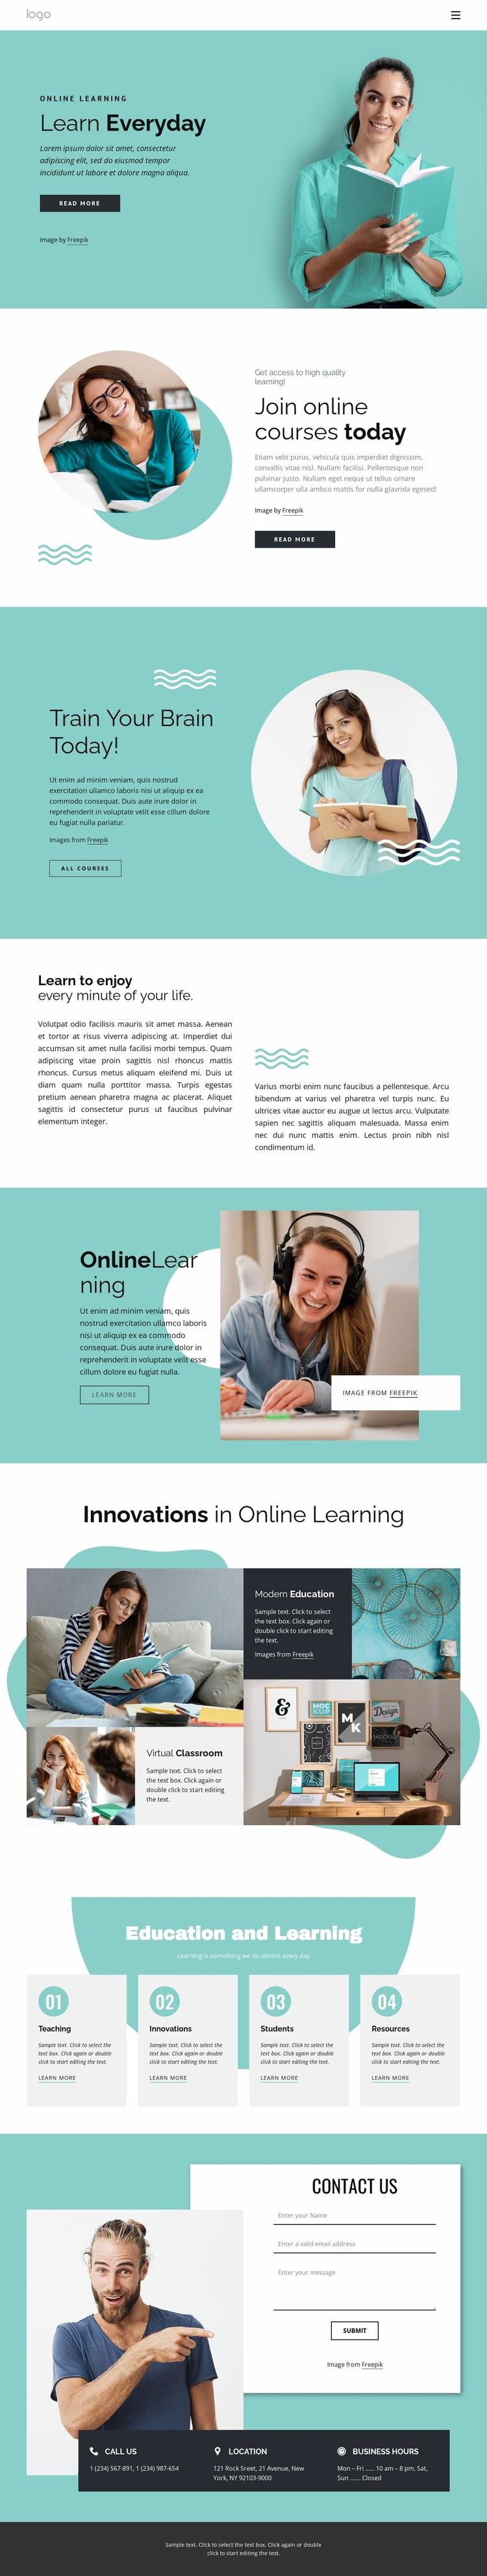 Learning is a lifelong process Website Design